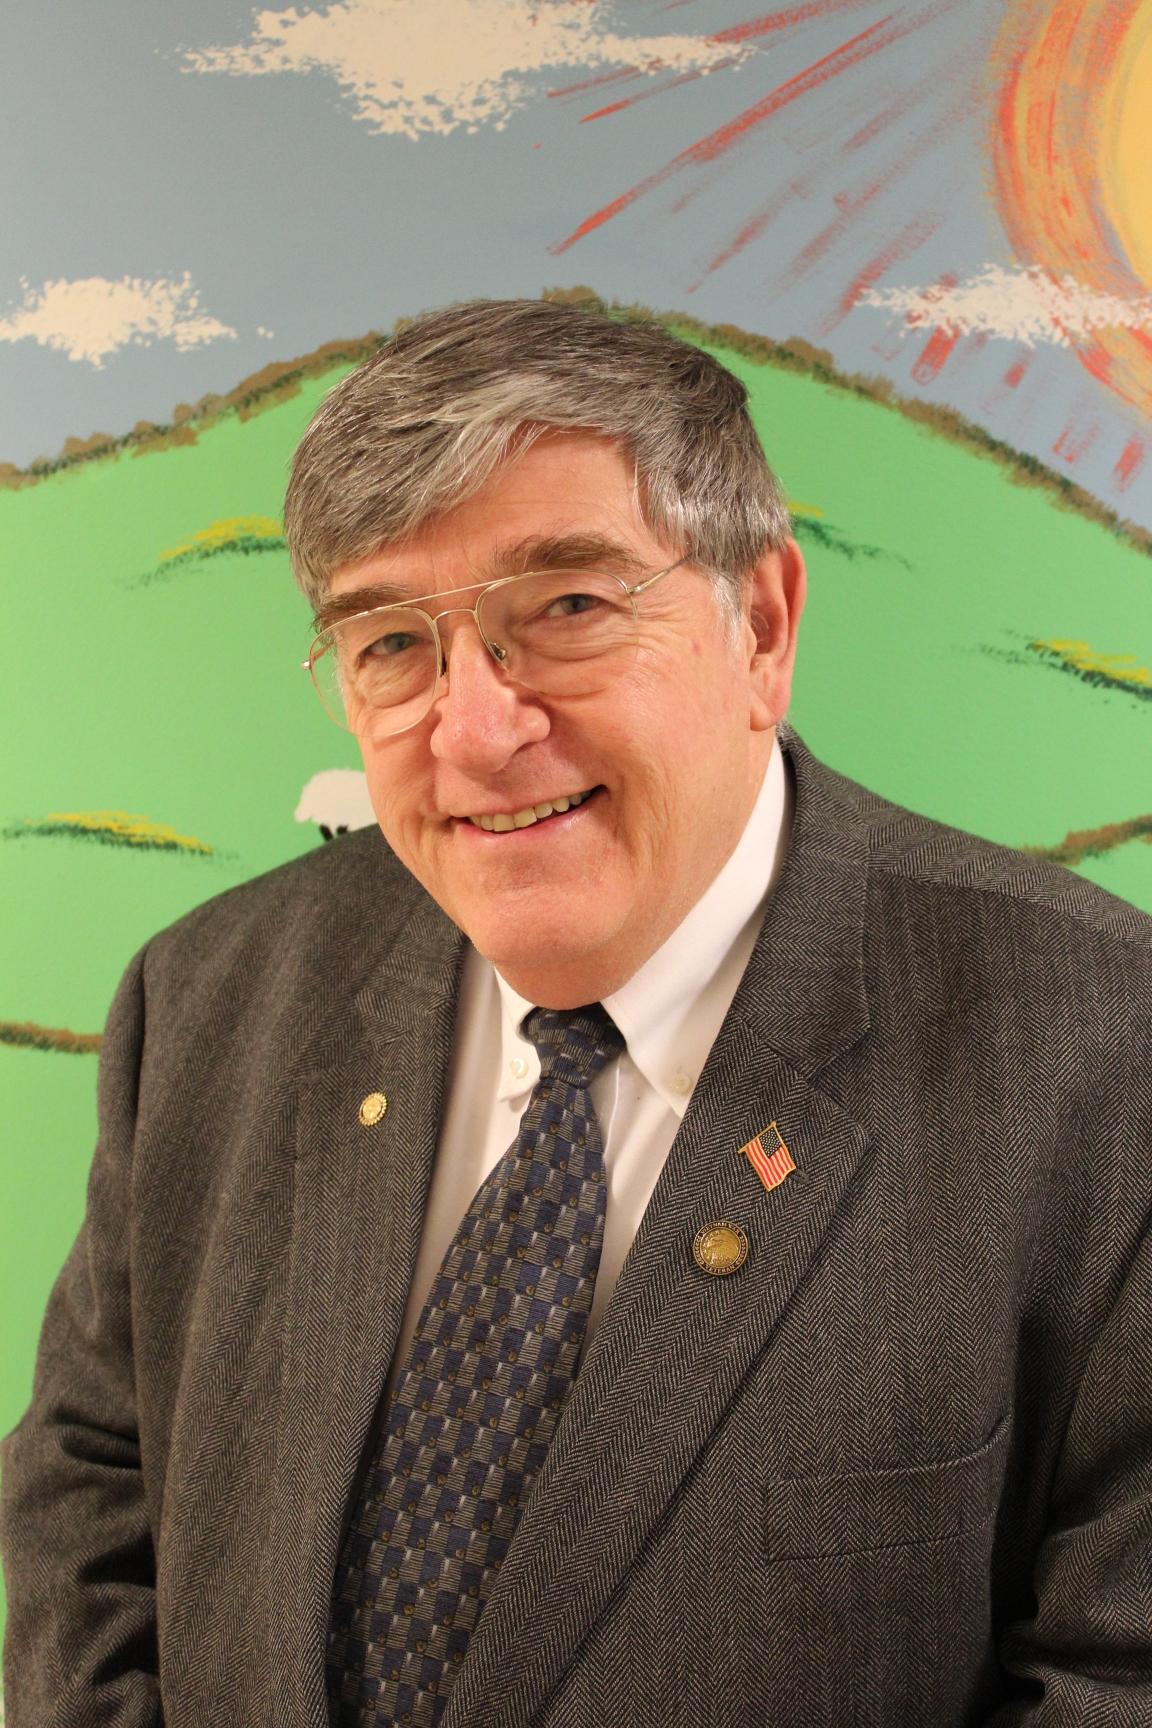 Jim Milliken